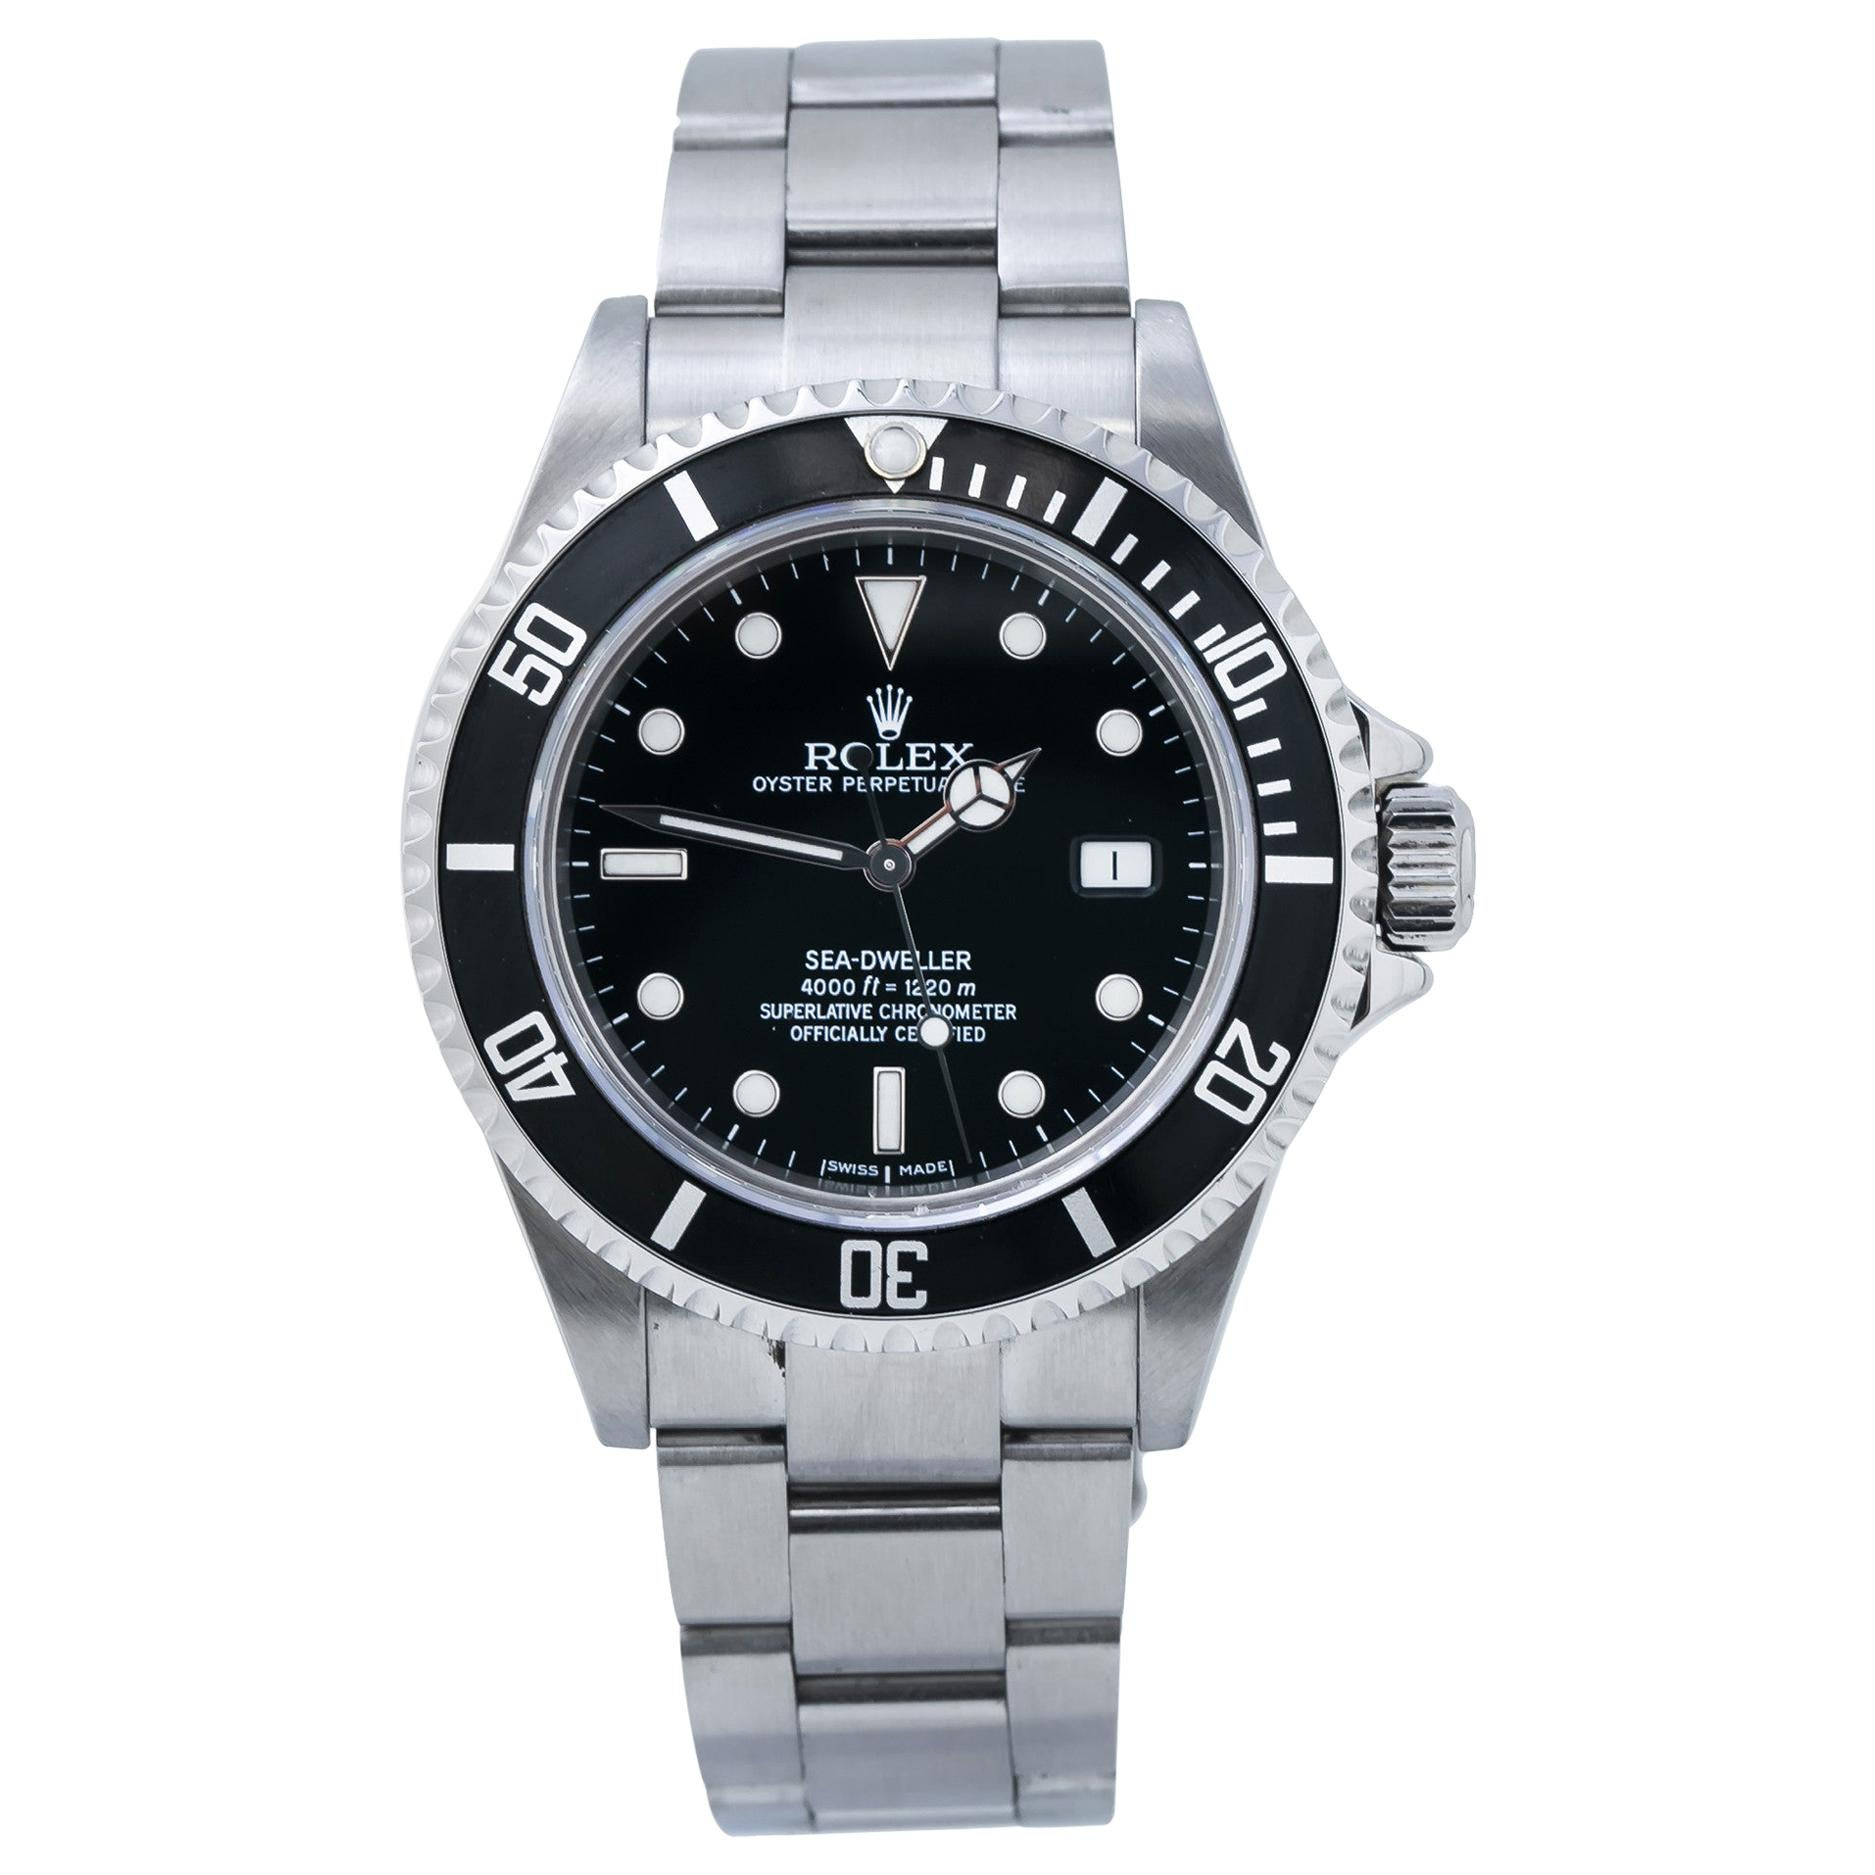 Rolex Sea-Dweller 16600, Black Dial, Certified and Warranty